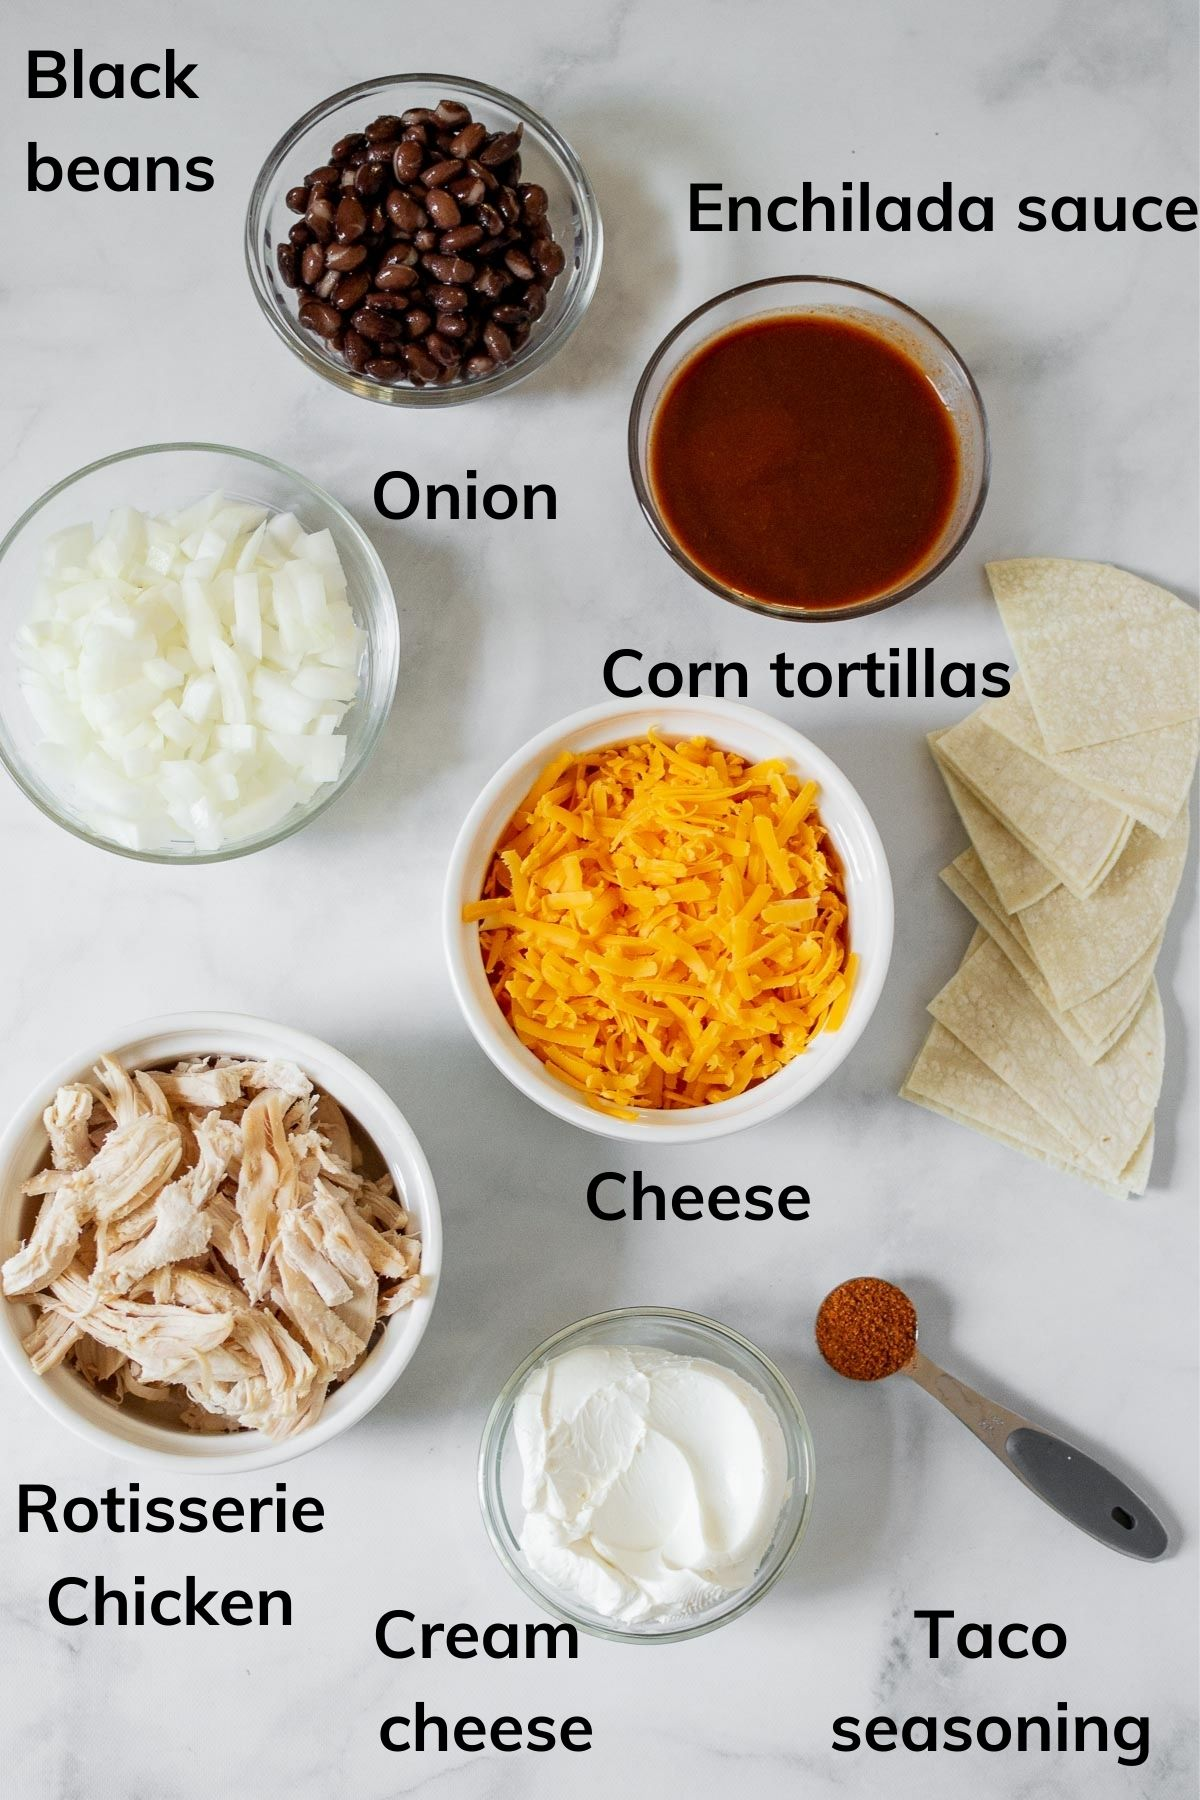 Ingredients needed to make this chicken enchilada skillet